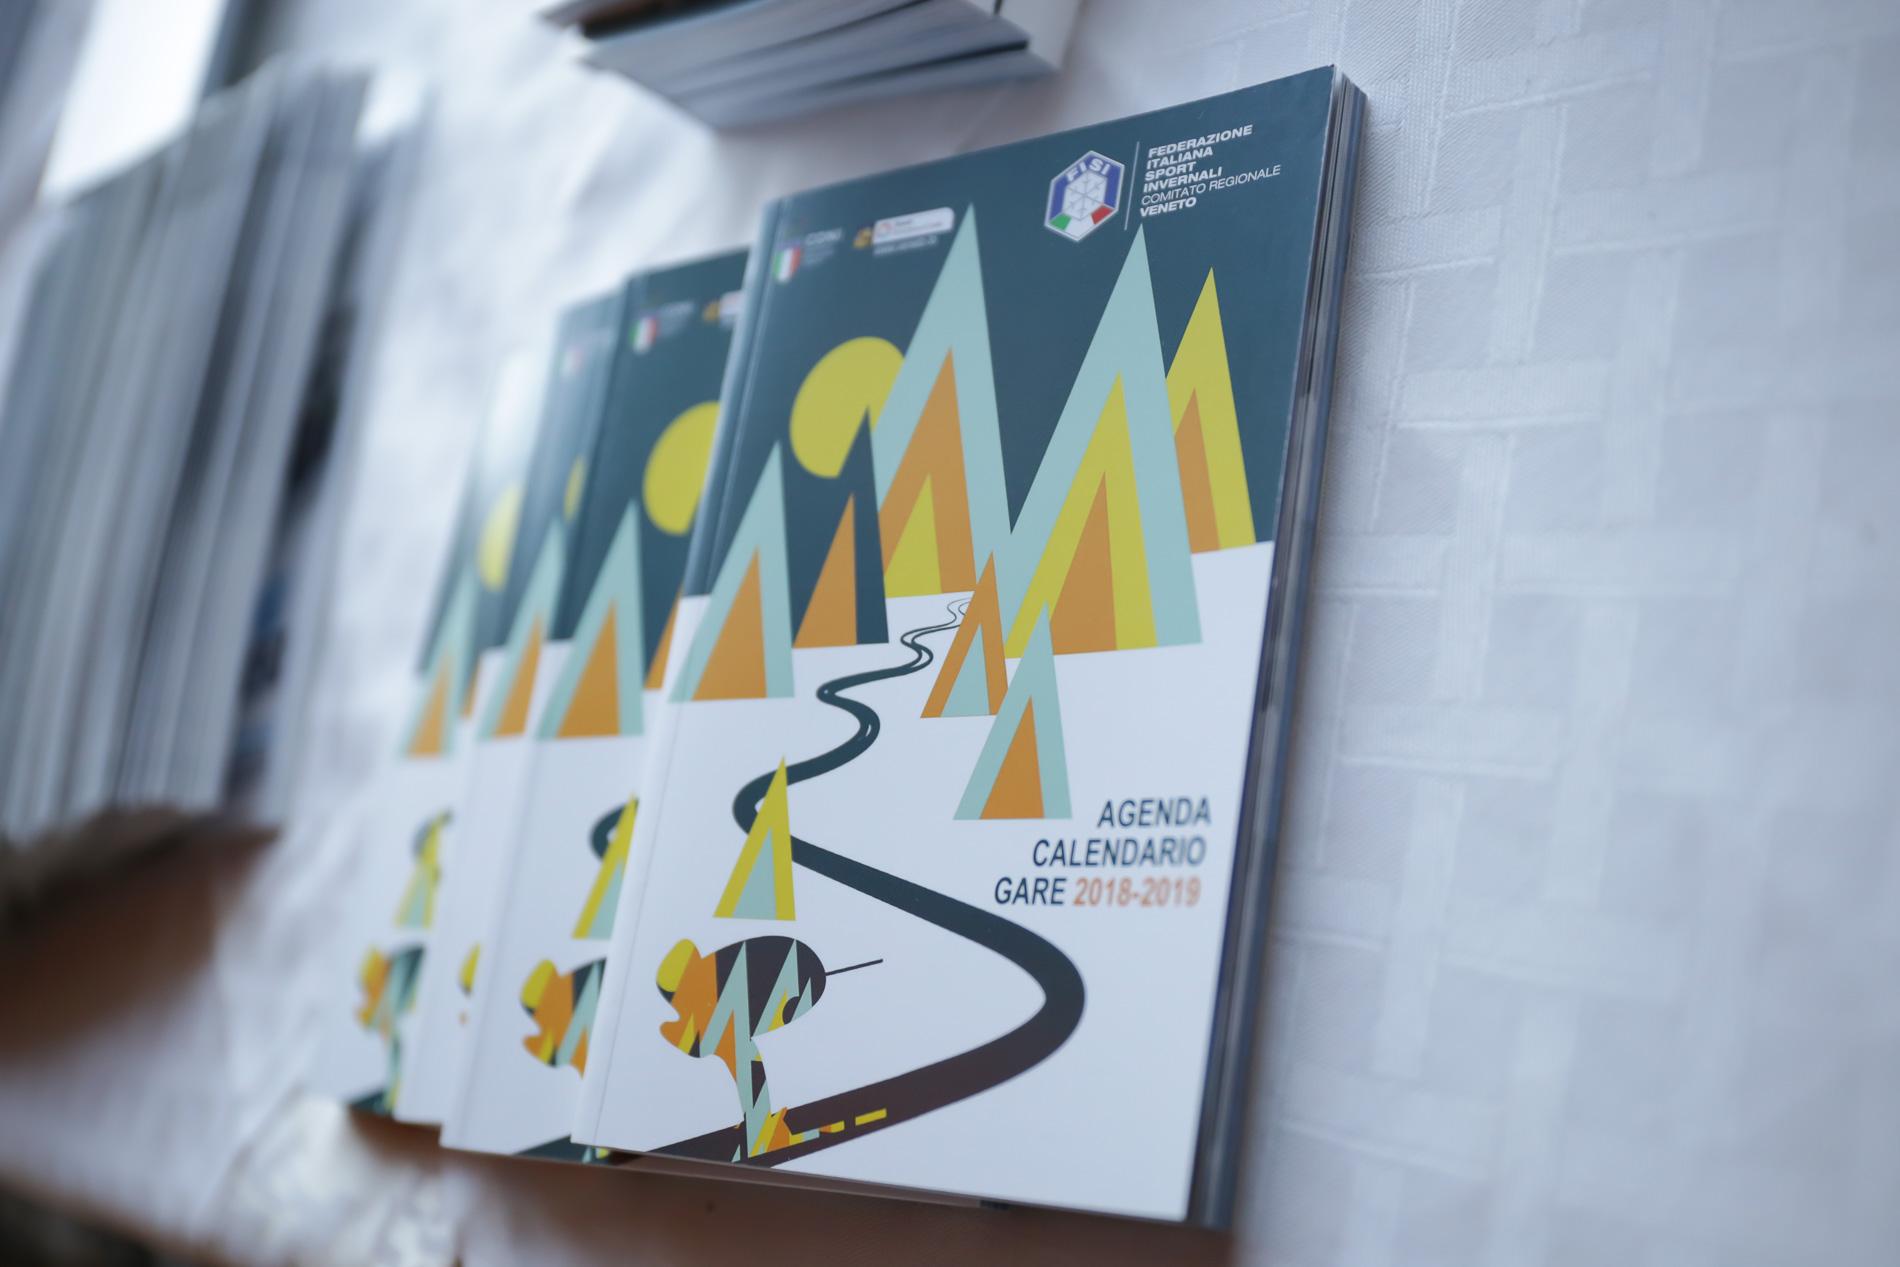 Fisi Veneto Calendario.Agenda Calendario Fisi Veneto 2018 2019 Scifondo